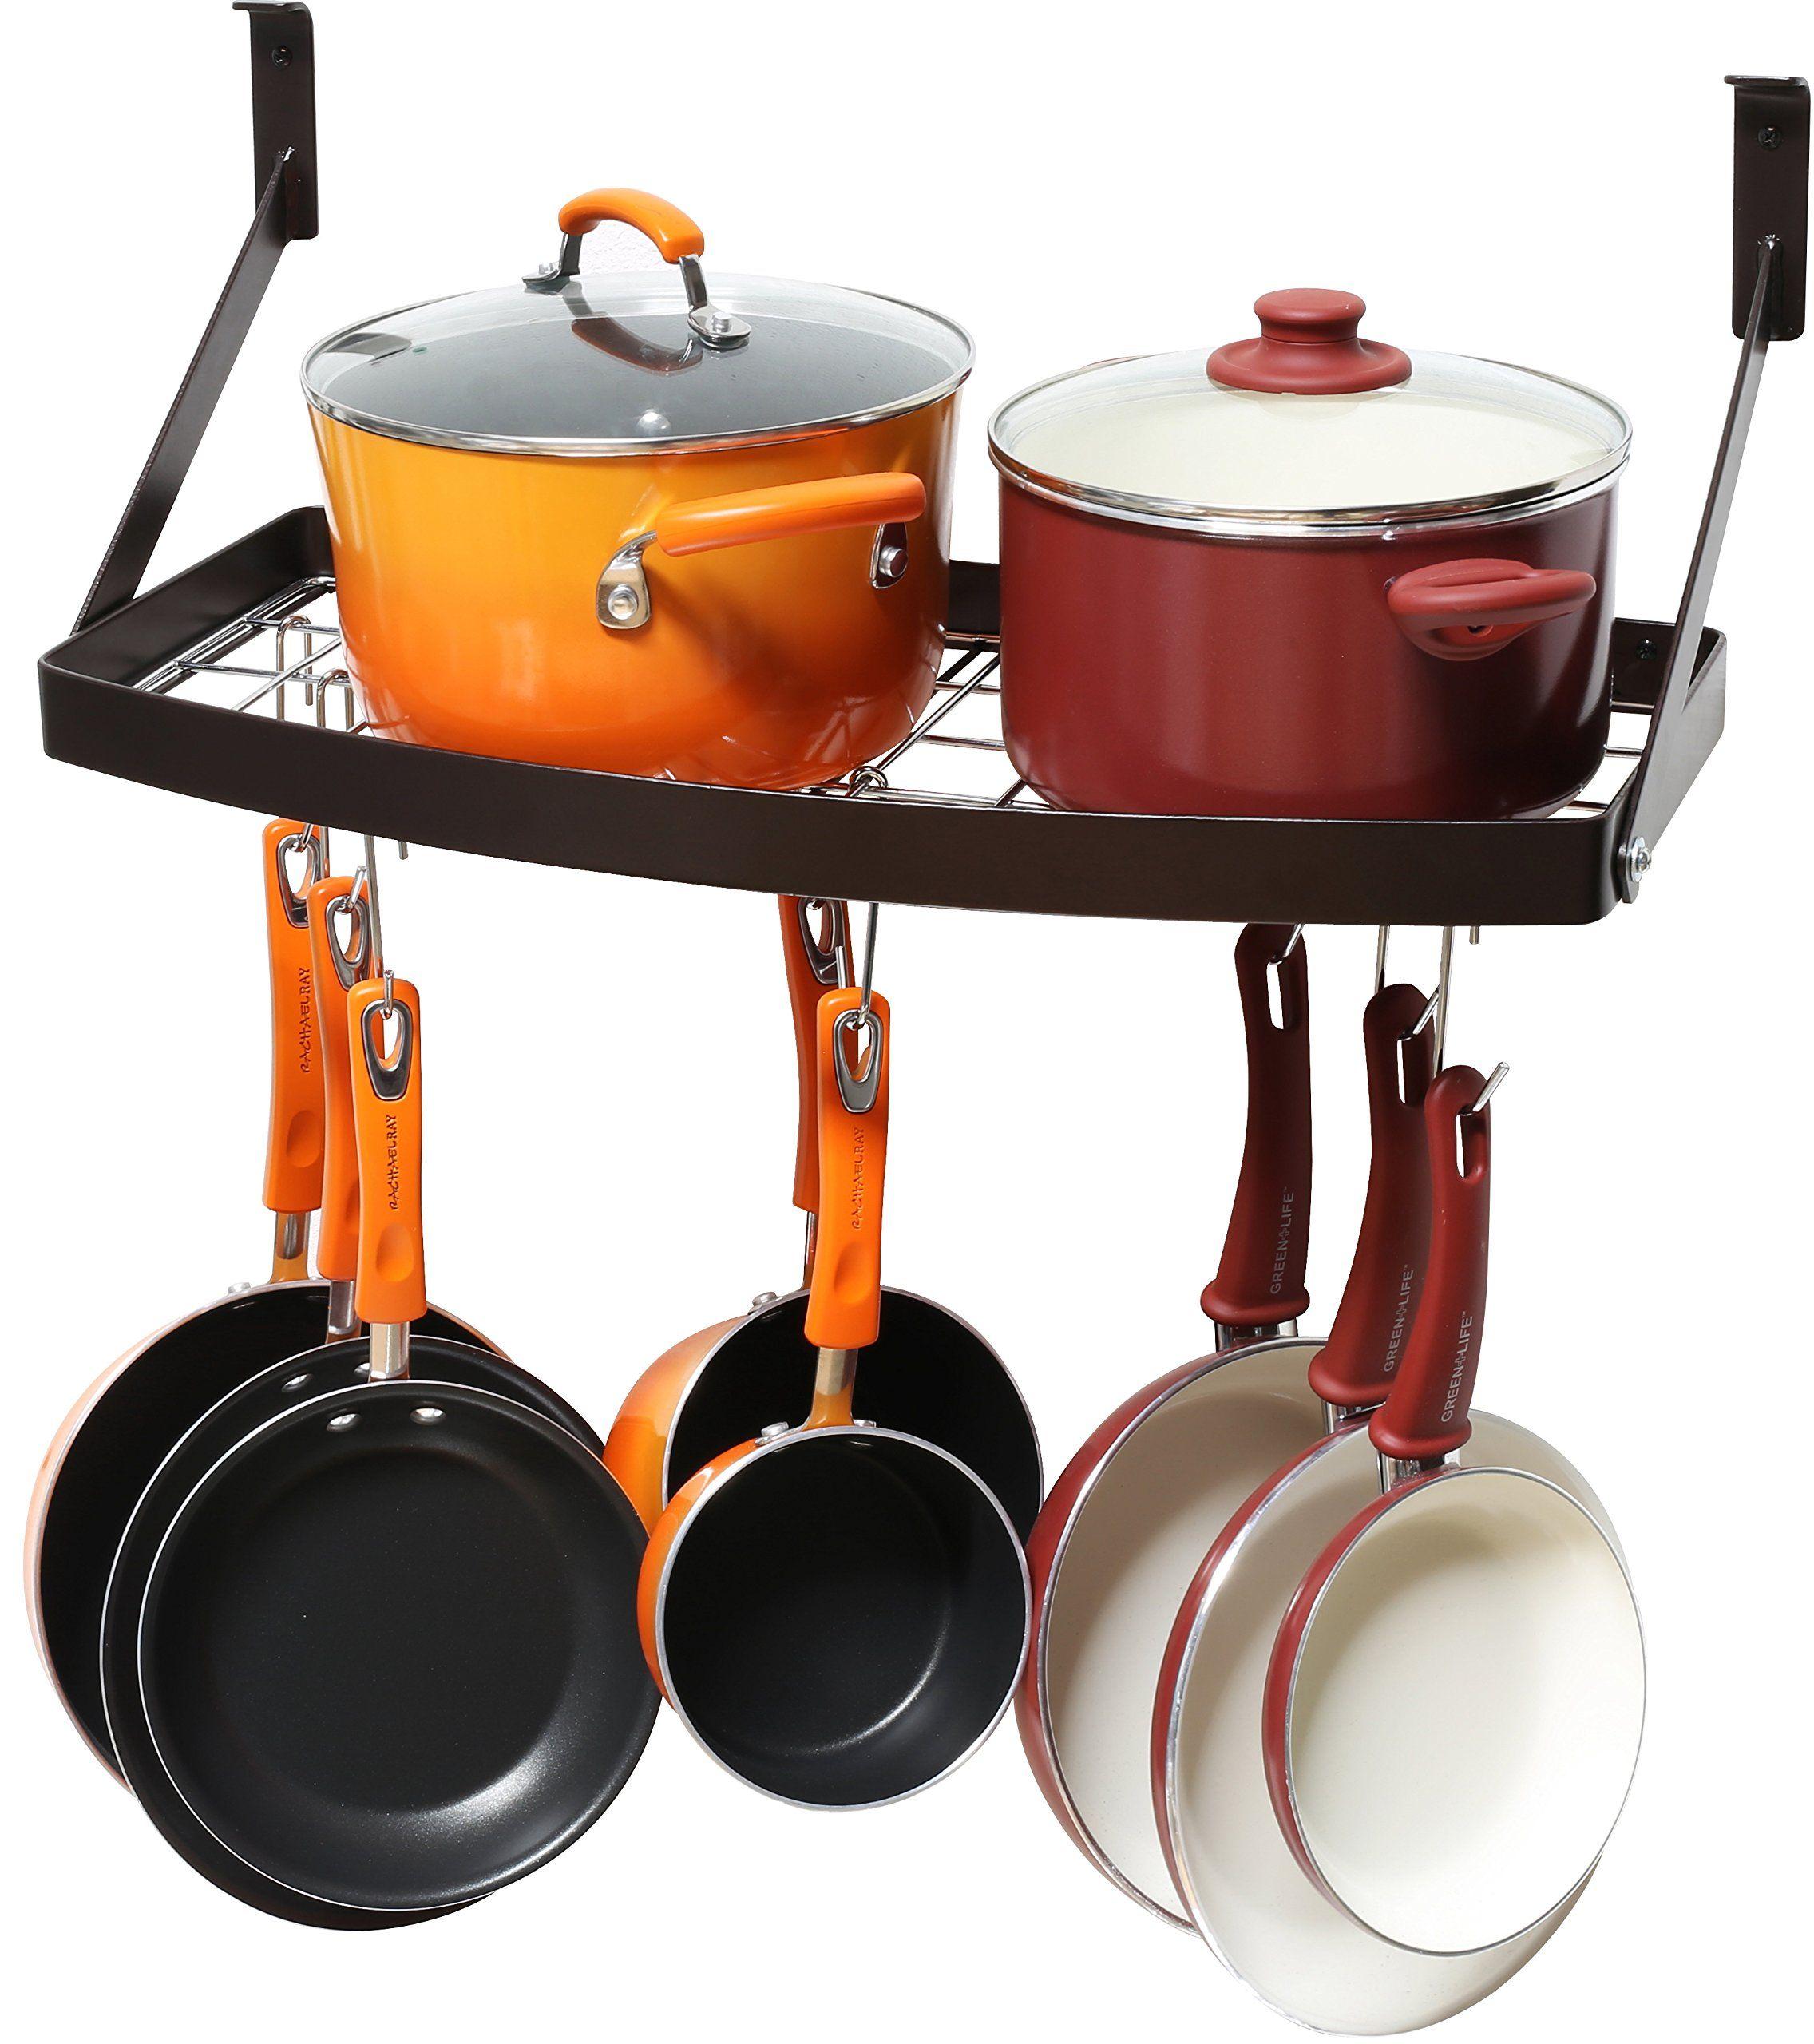 Robot Check Pot Rack Kitchen Wall Mounted Kitchen Storage Cookware Storage